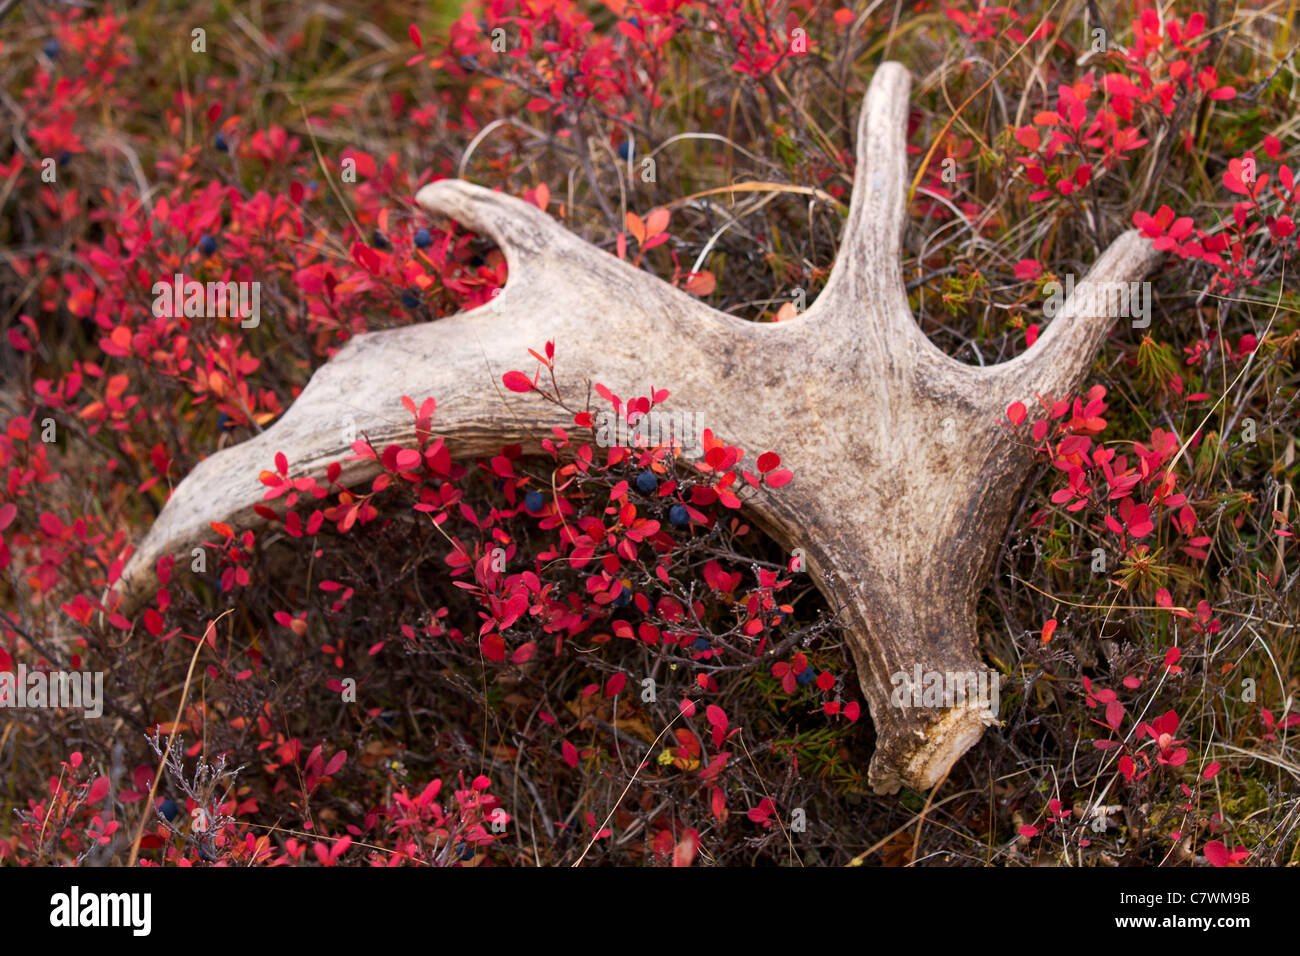 Corna di alce, Parco Nazionale di Denali, Alaska. Immagini Stock